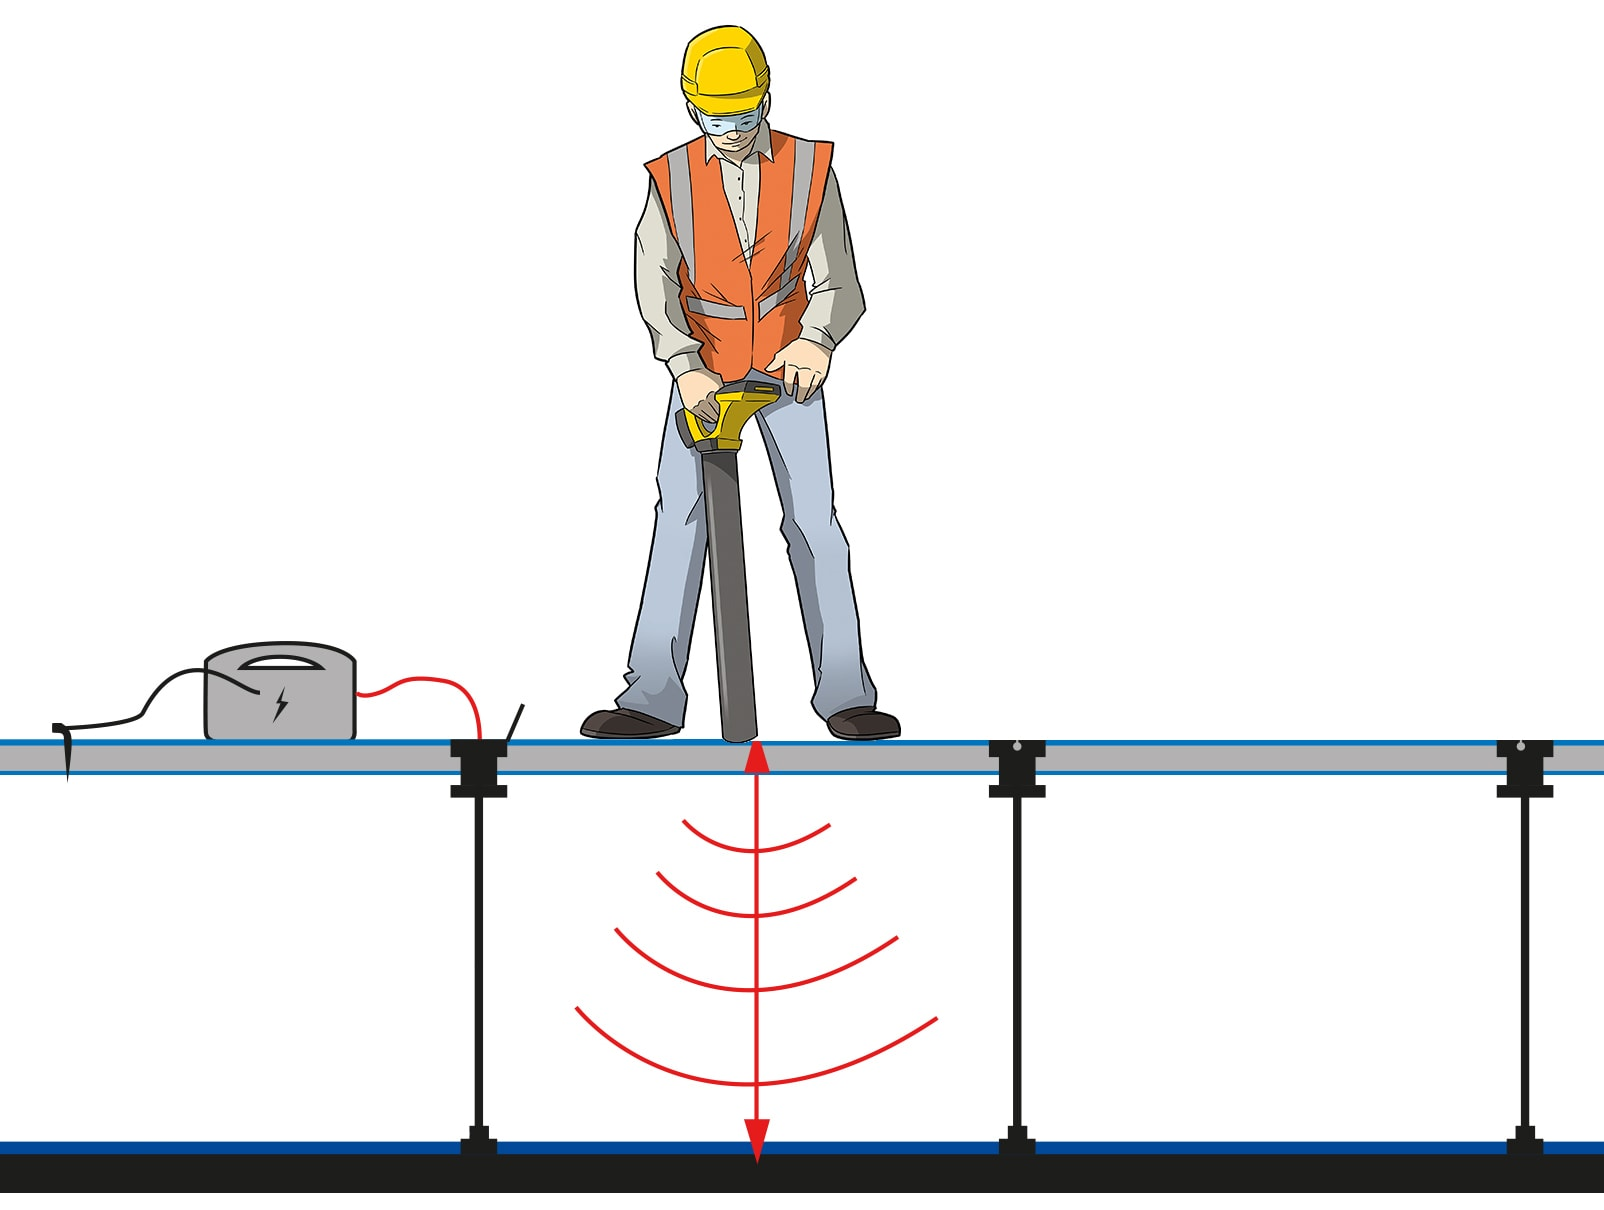 Sistema-di-georeferenziazione-delle-infrastrutture-di-reti-interrate2